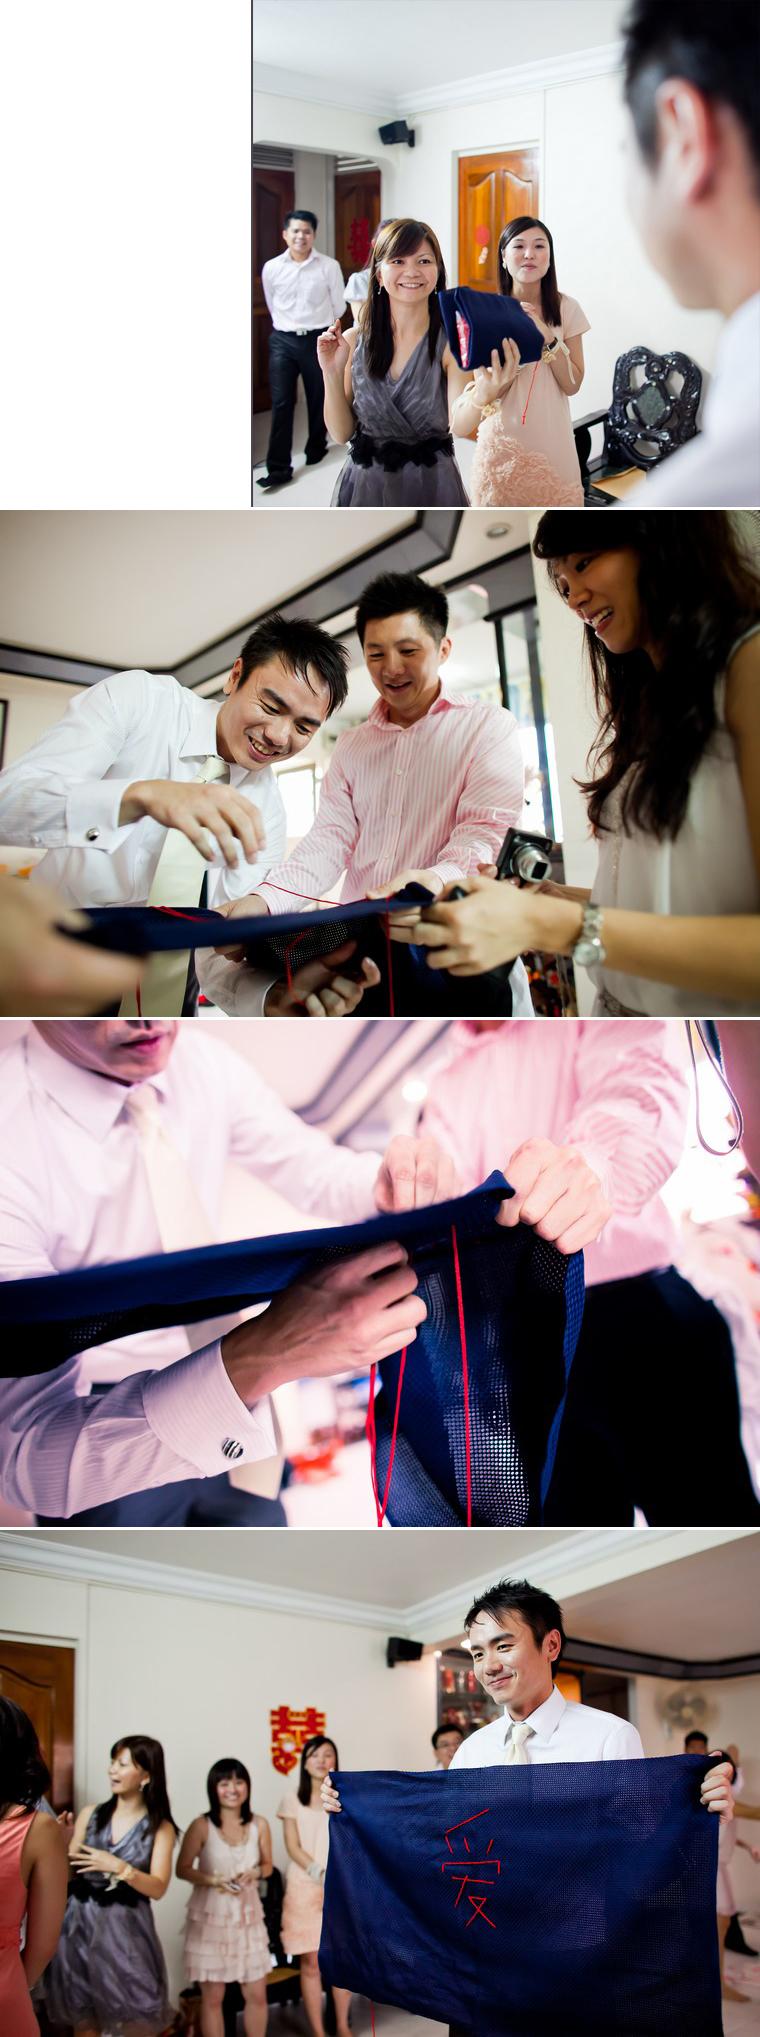 Raymond Phang Wedding Day Kangwei Shuqin-04